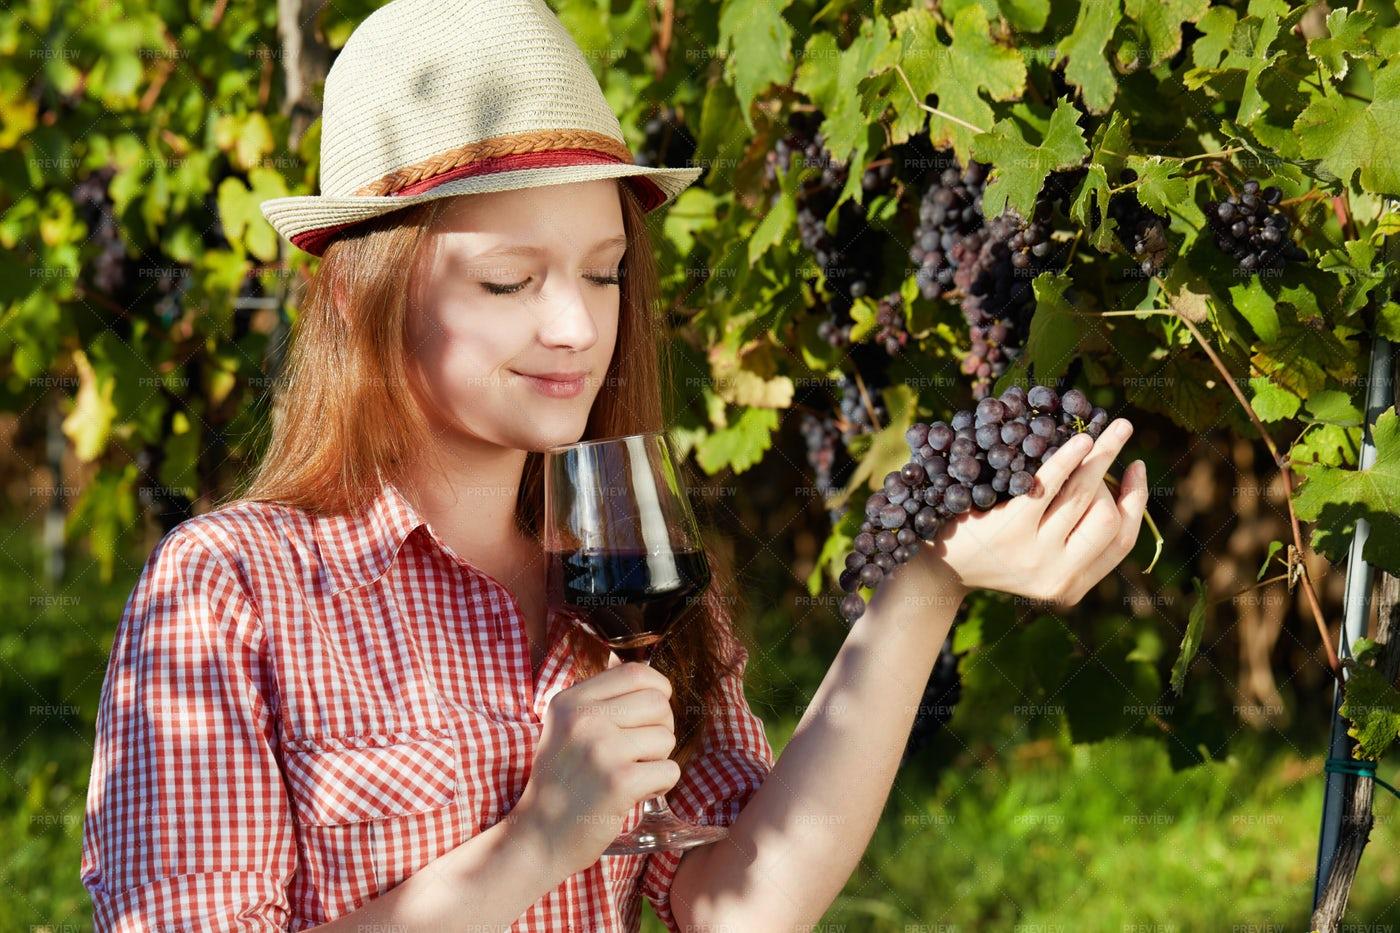 The Vineyard Yield: Stock Photos